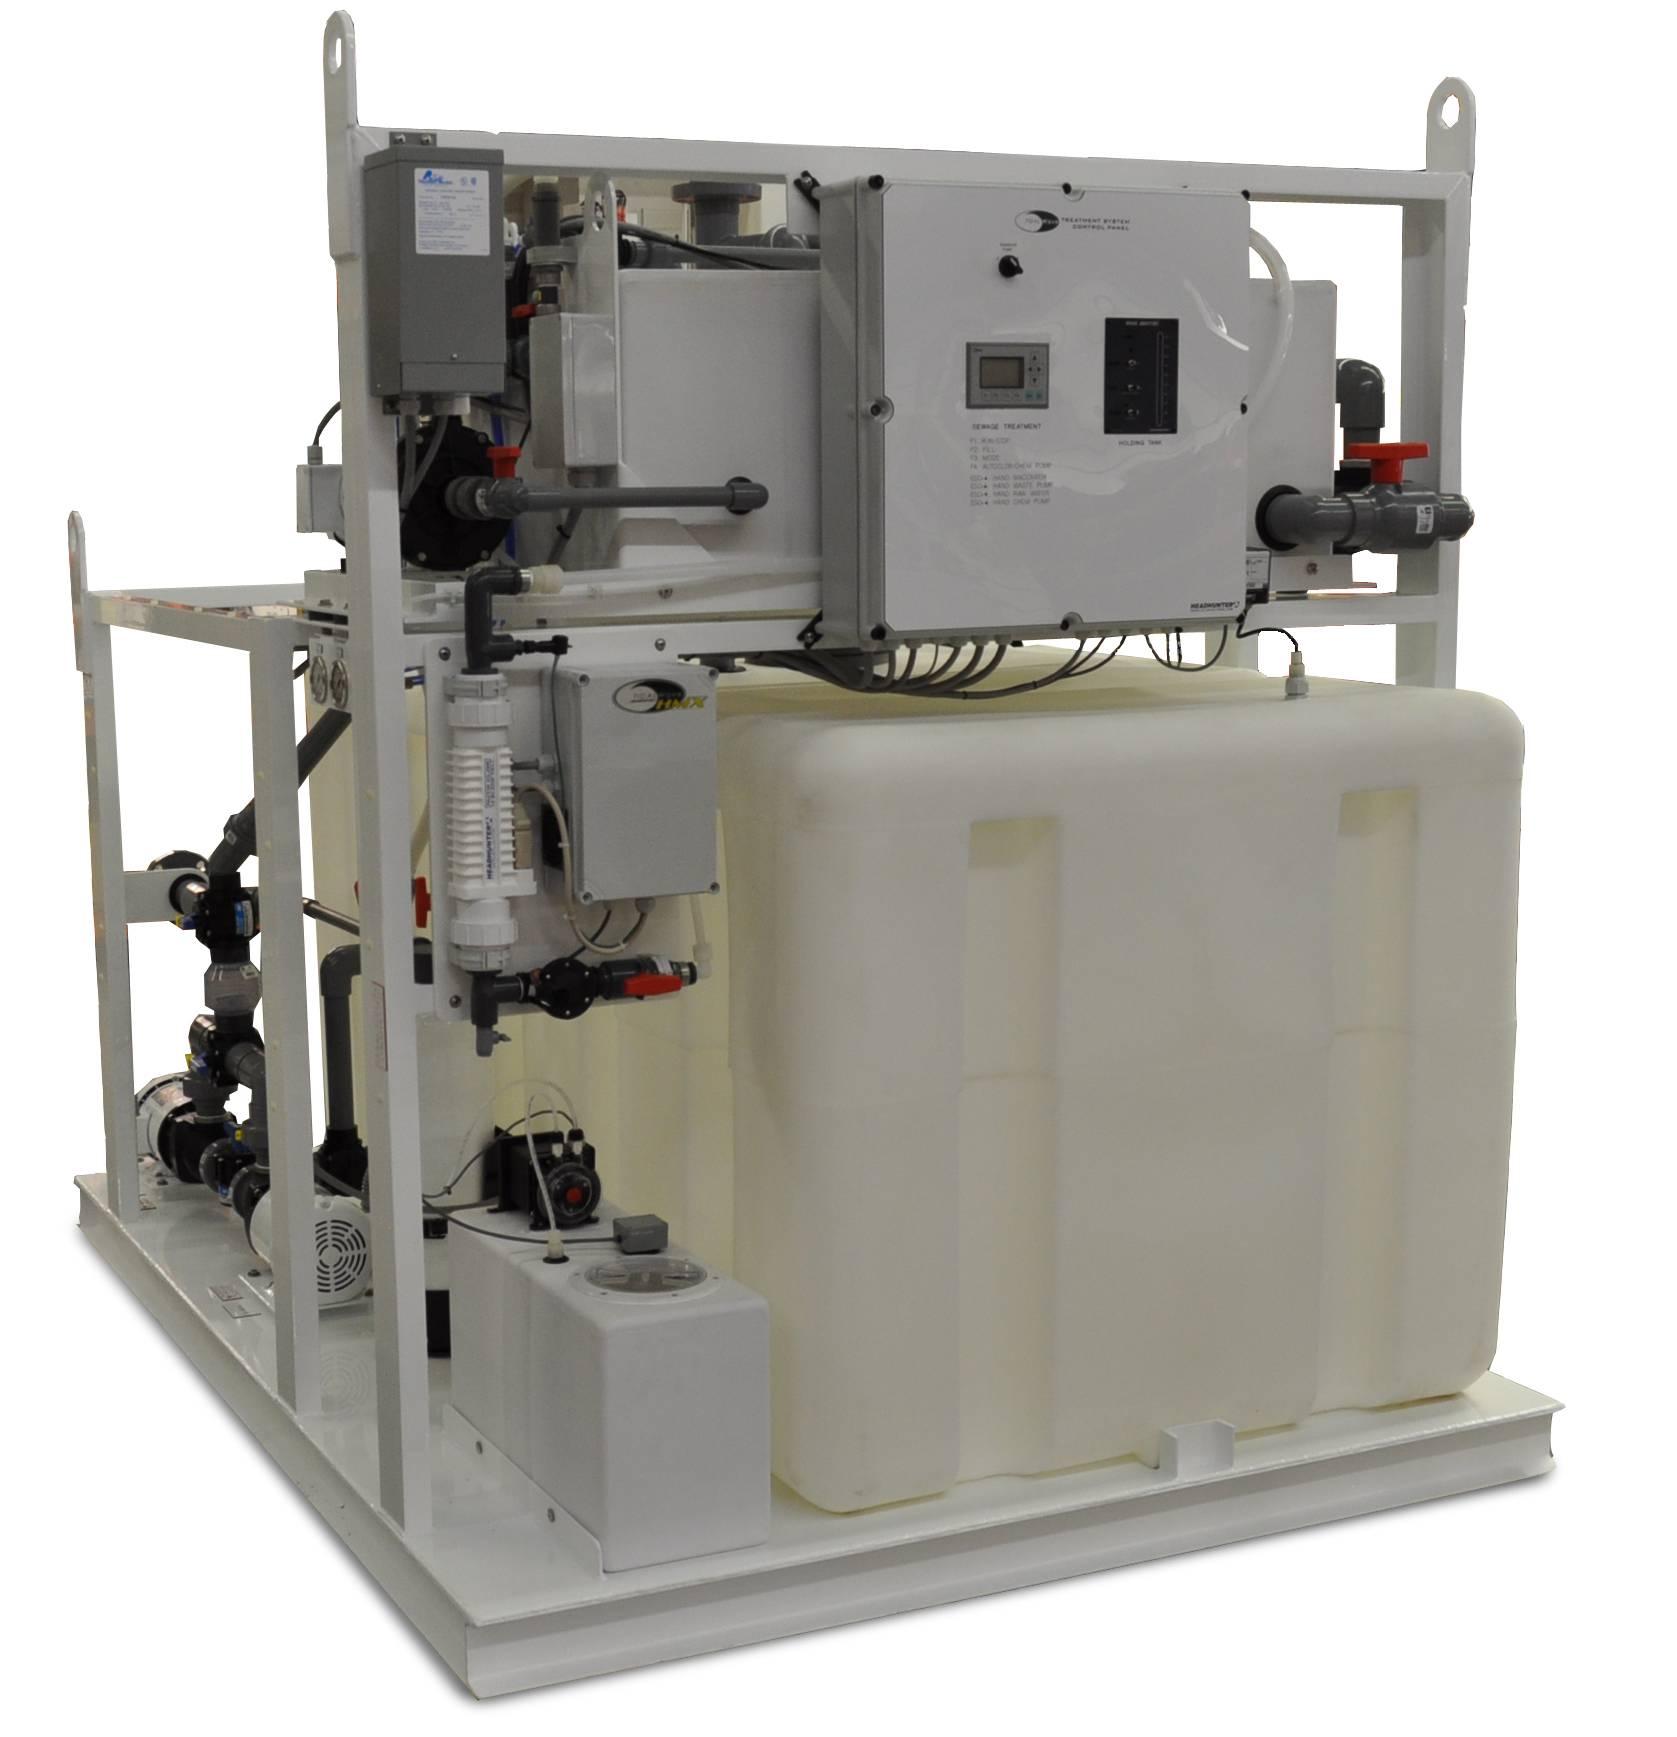 headhunter installs sewage treatment plant on aet. Black Bedroom Furniture Sets. Home Design Ideas